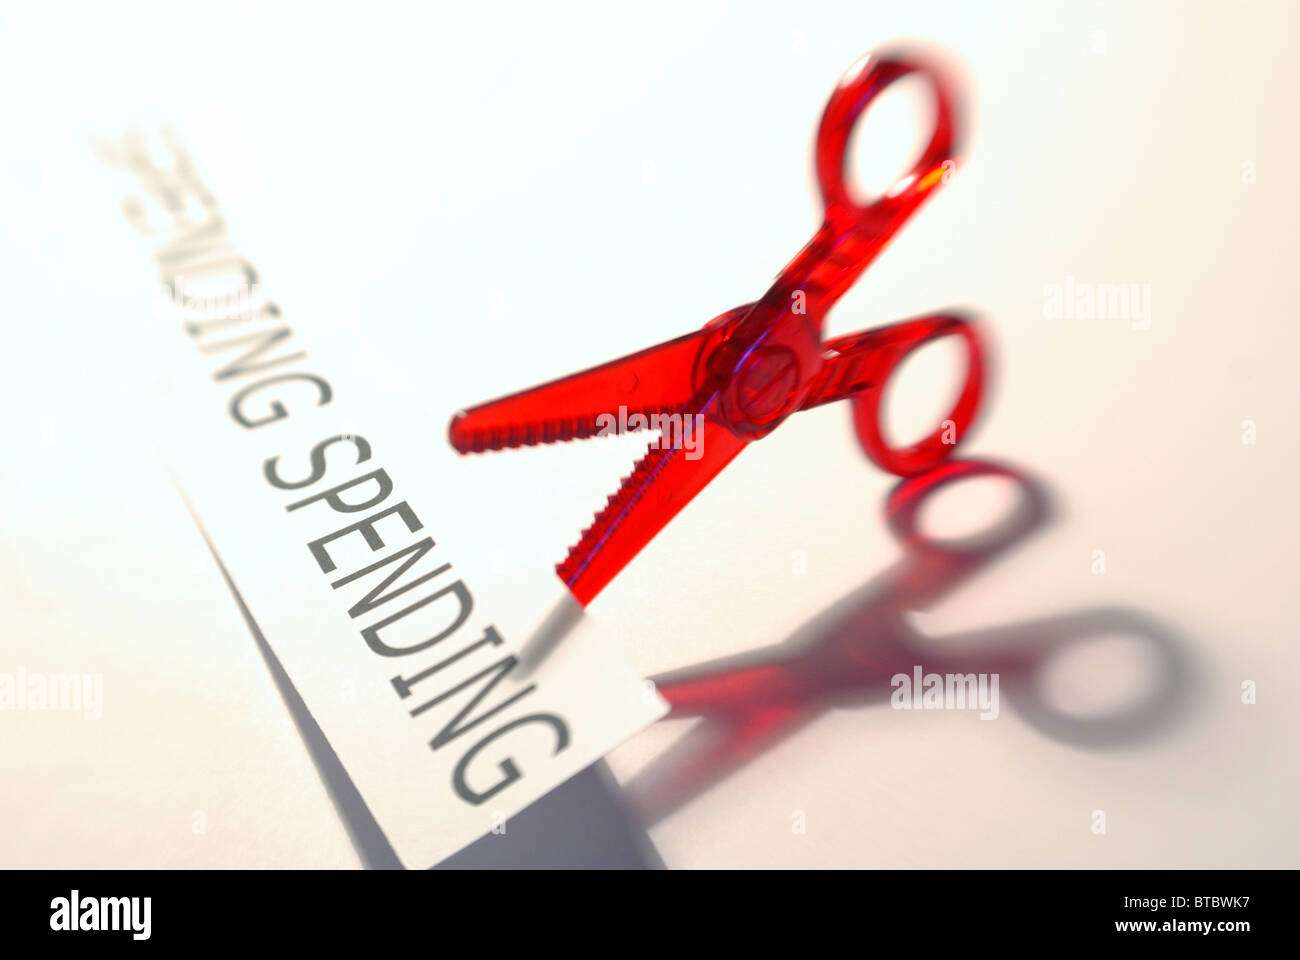 deficit spending stock photos deficit spending stock images alamy